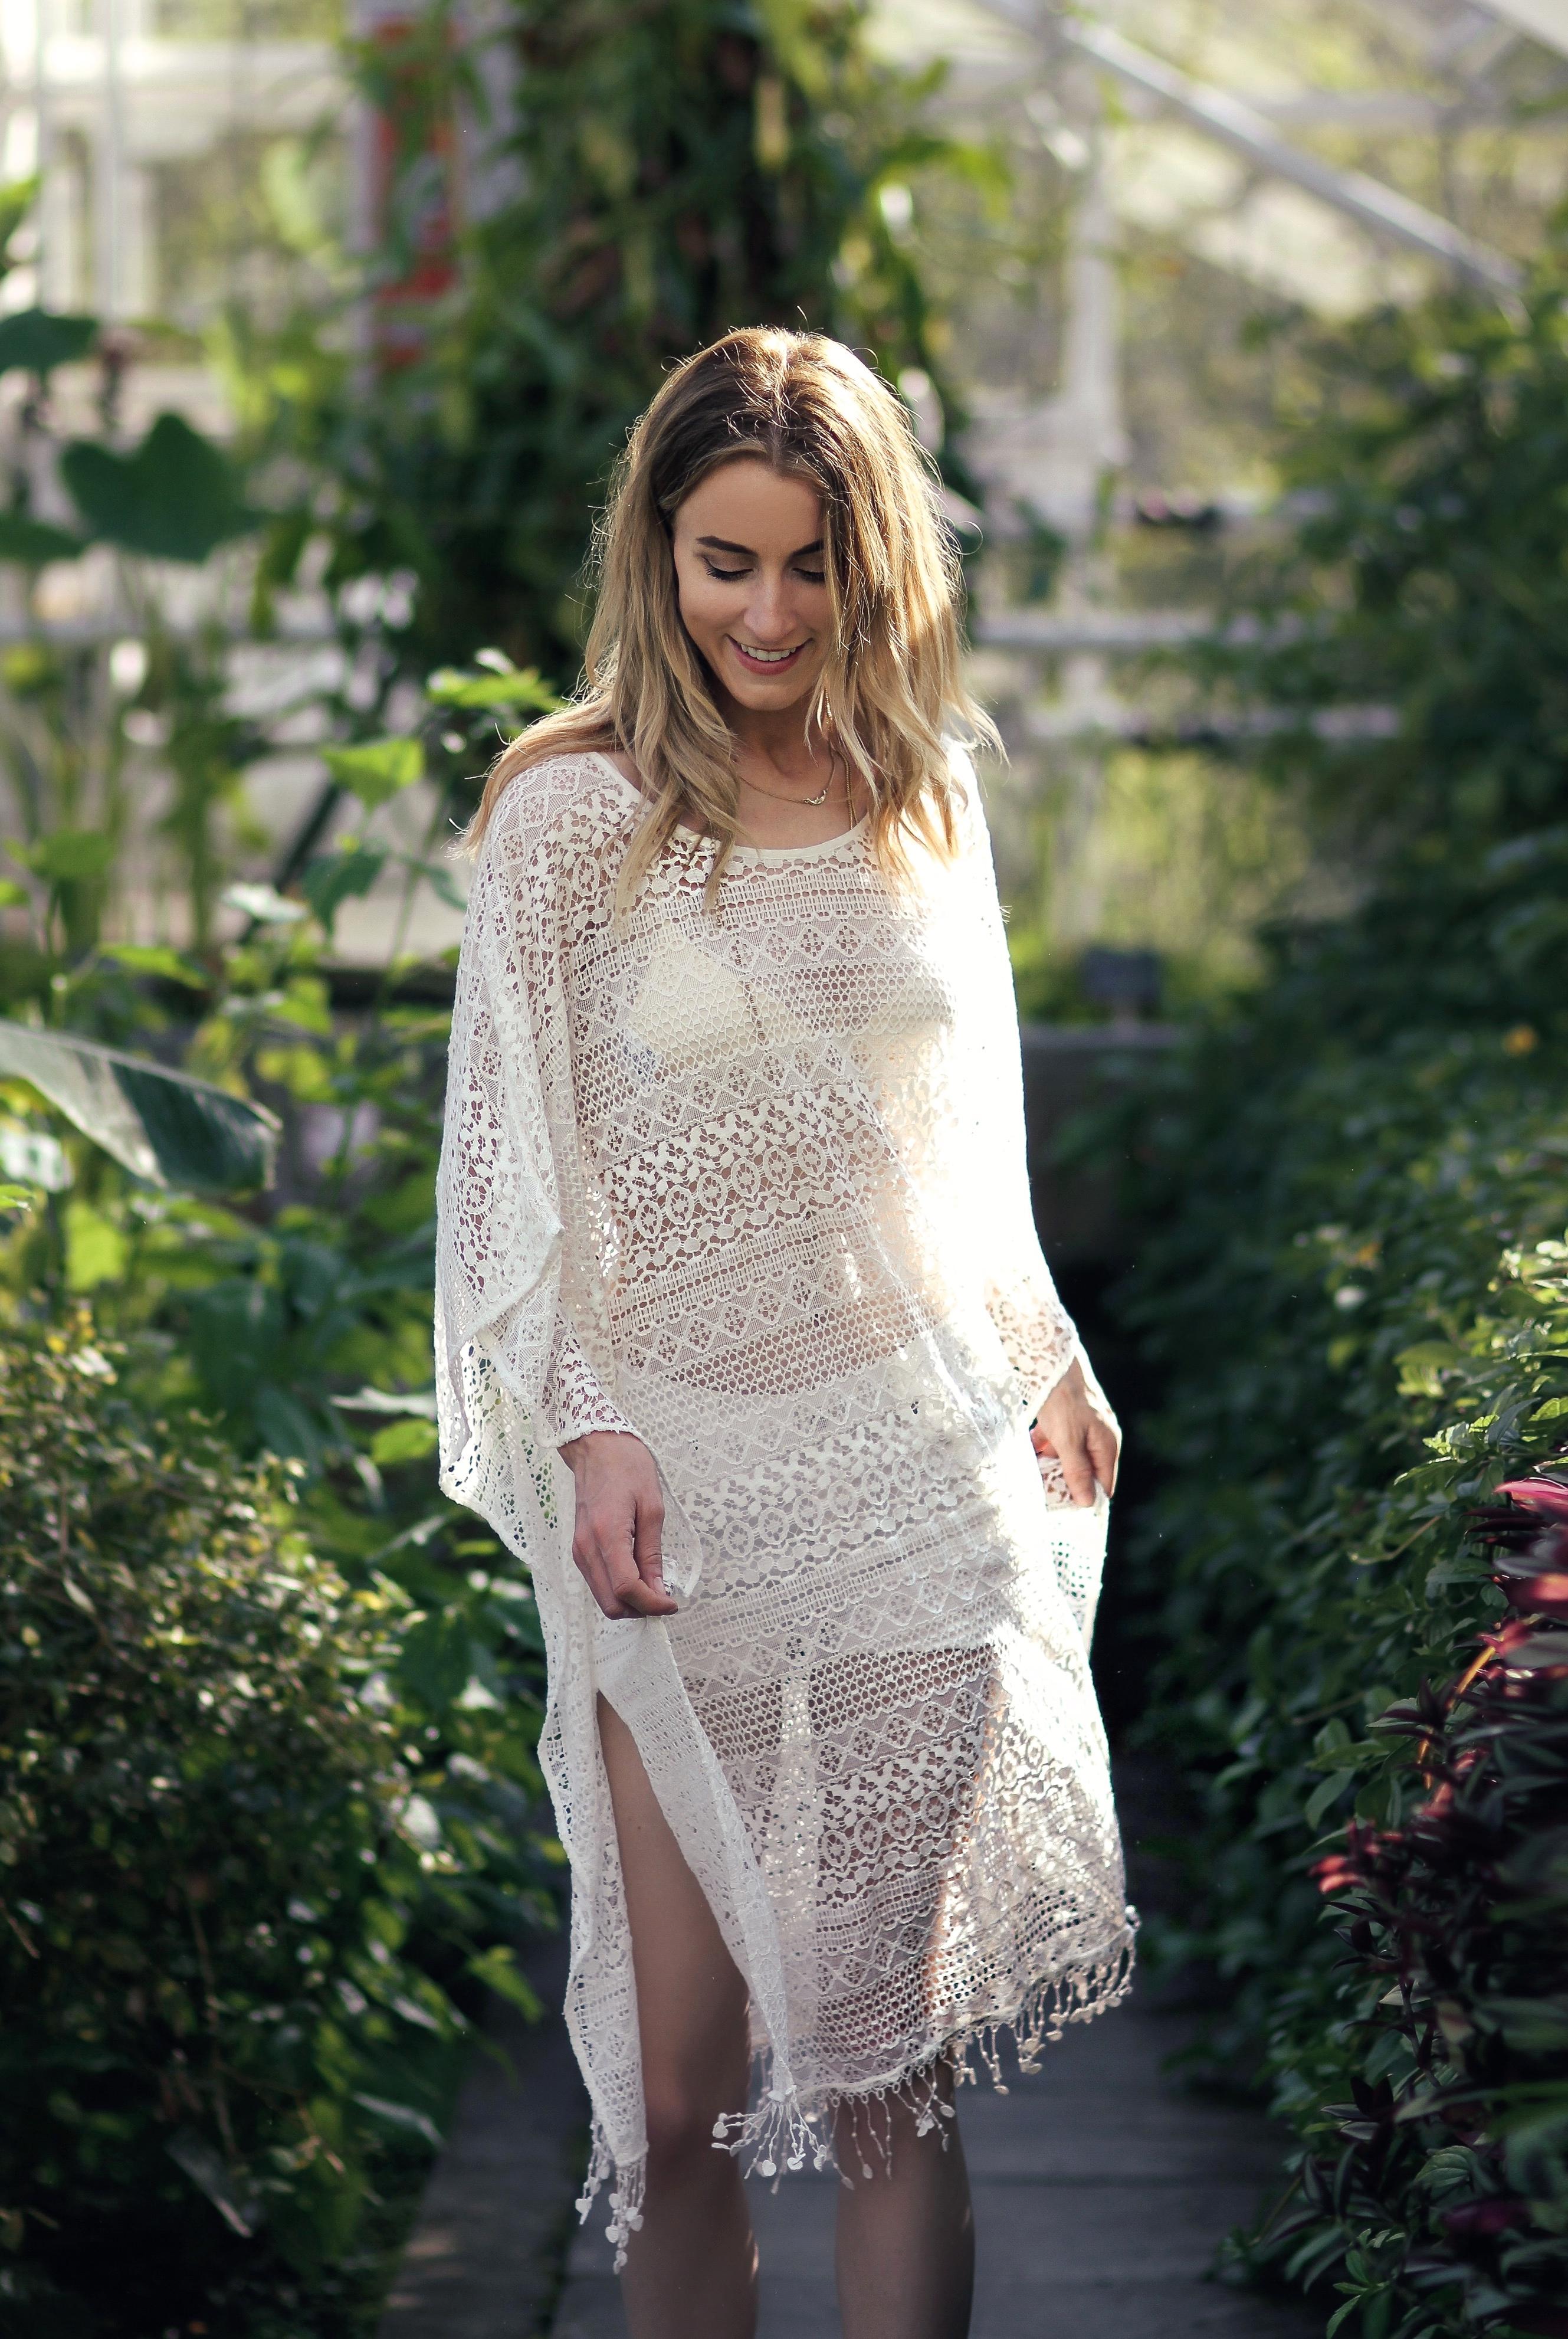 17-tunic-dress-ideas